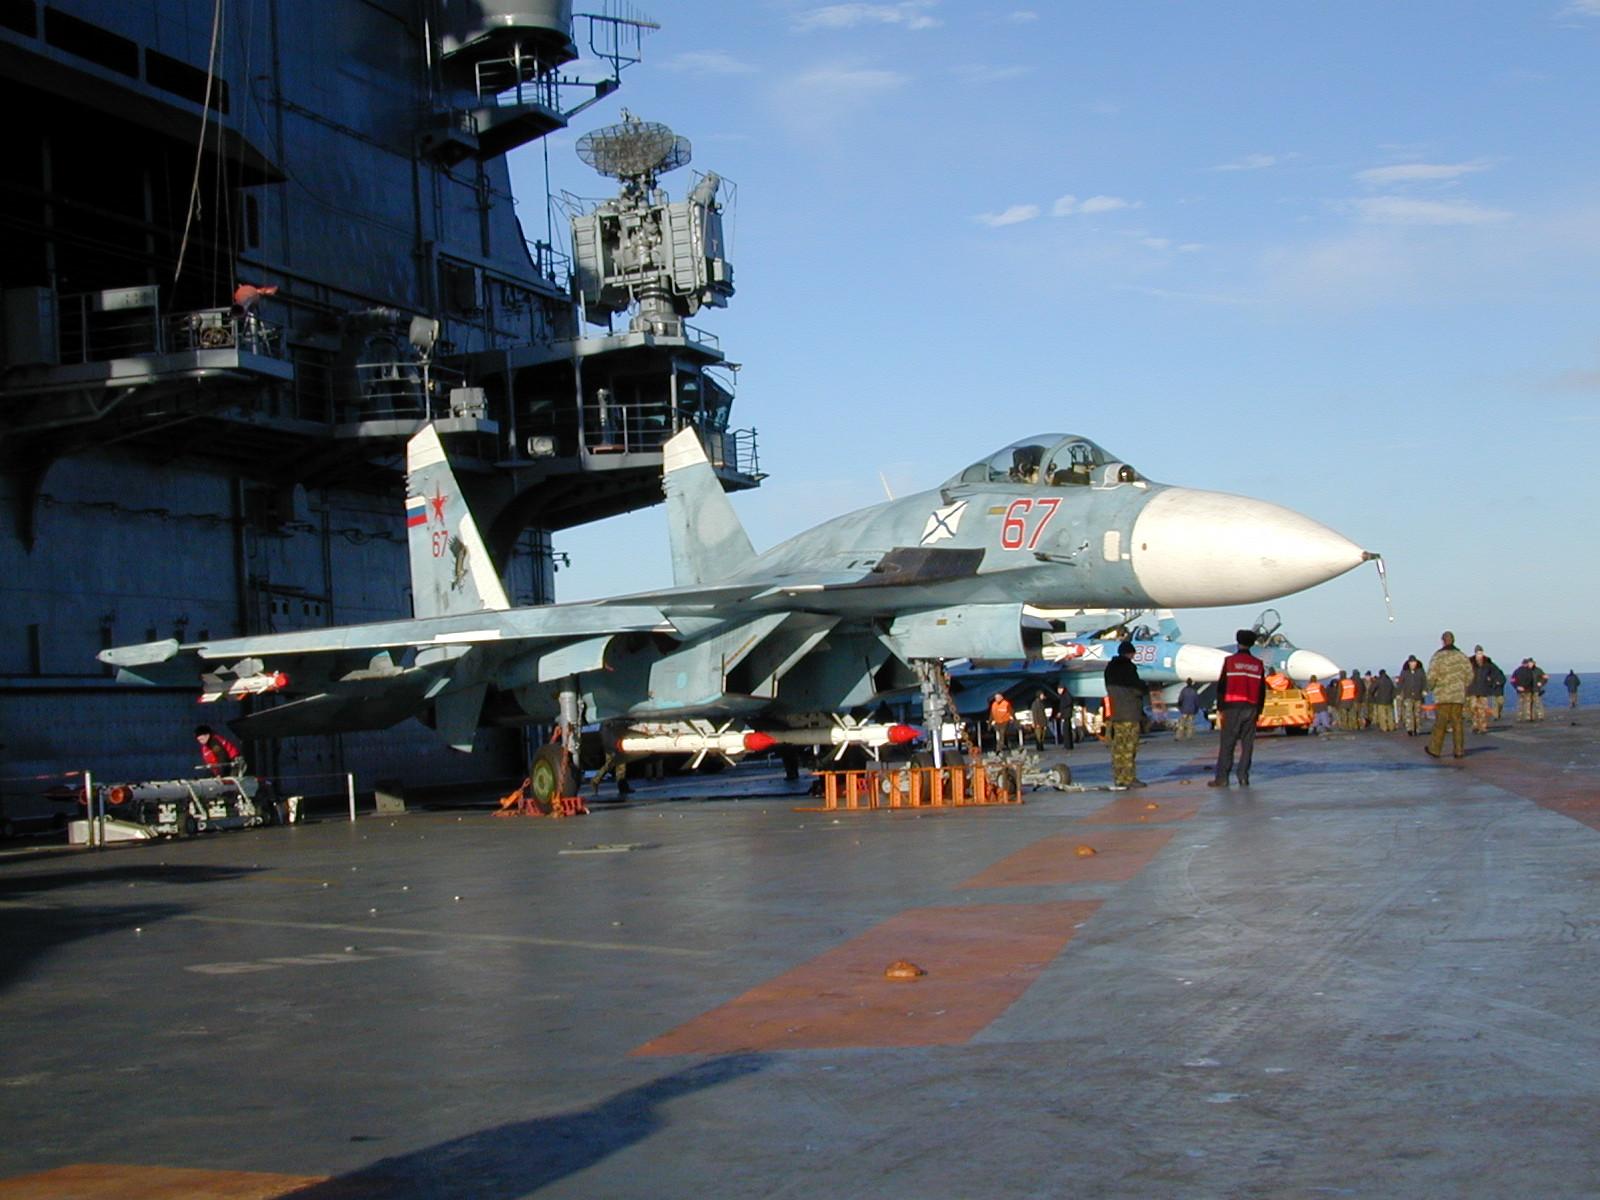 russie KUZ+SU-33+67+ARMADO+PITOT+ROTO